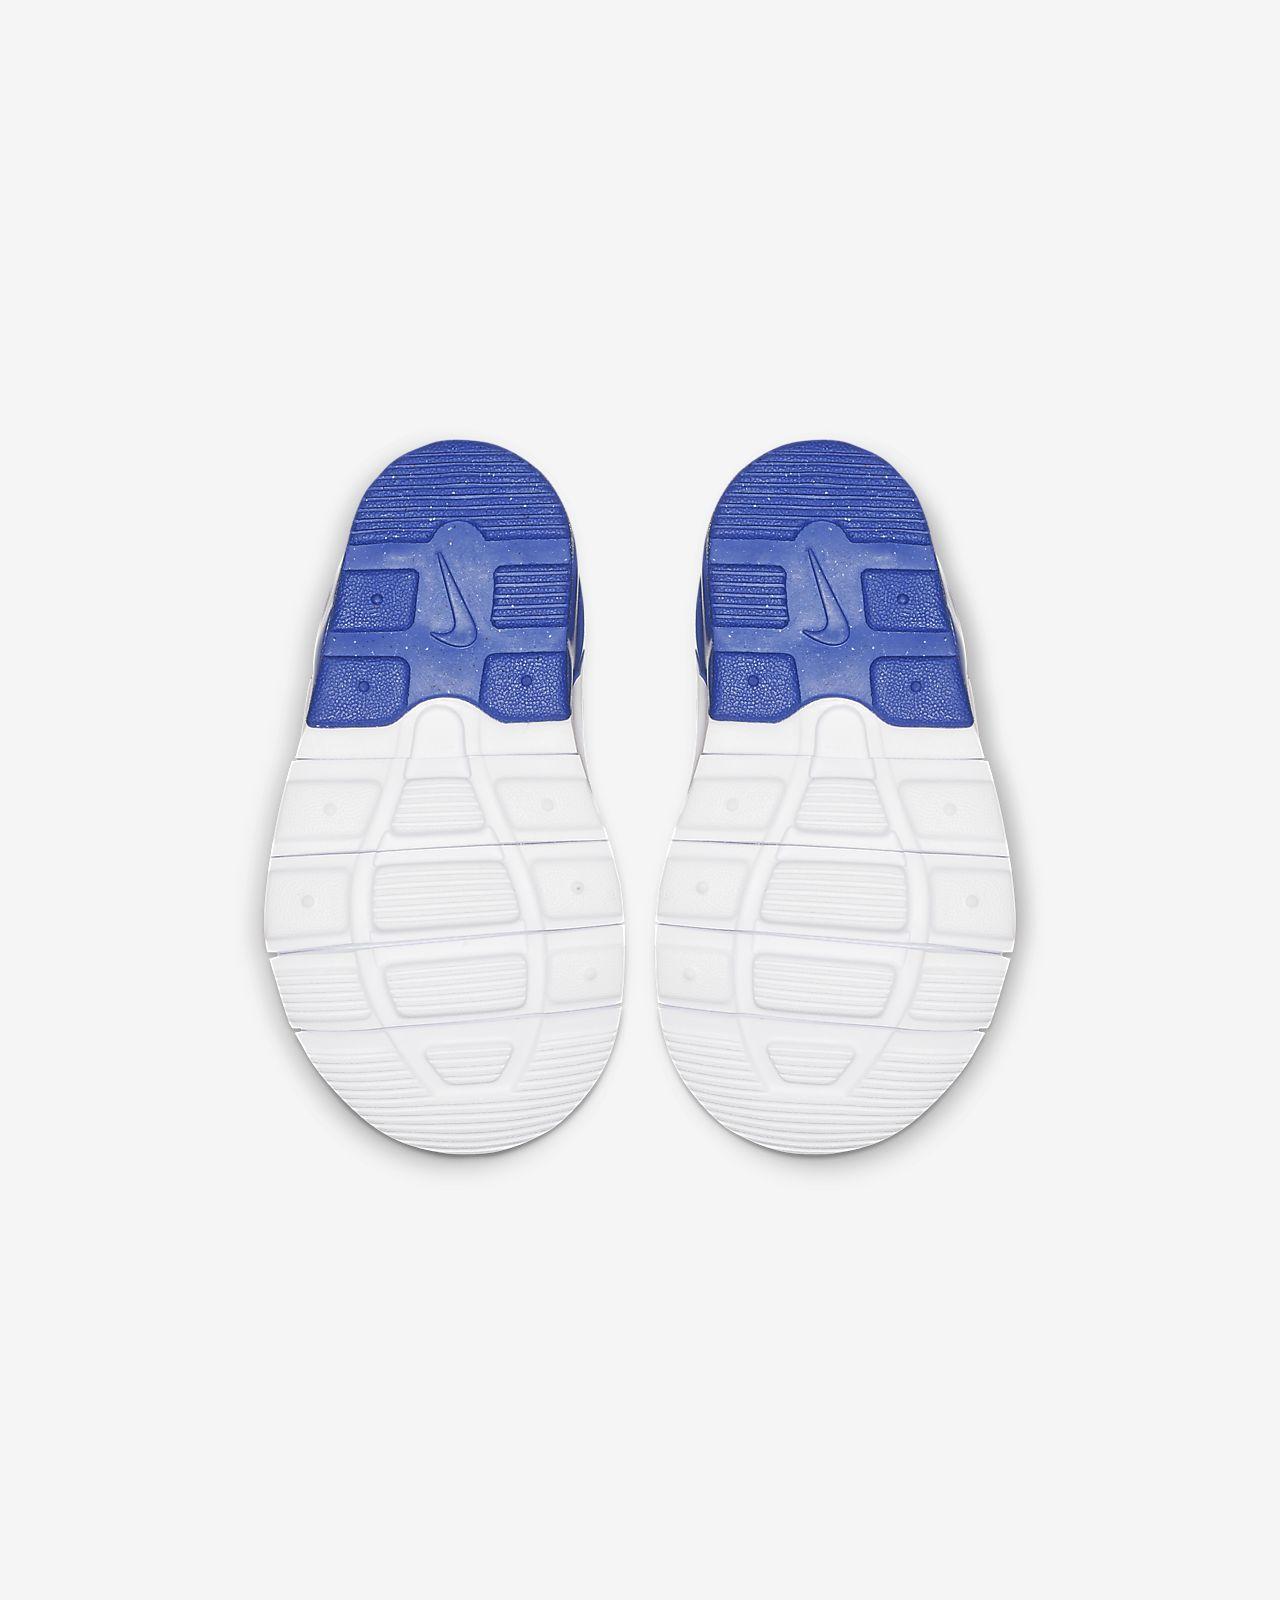 b4960174336 Nike Air Max Motion 2 Infant Toddler Shoe. Nike.com